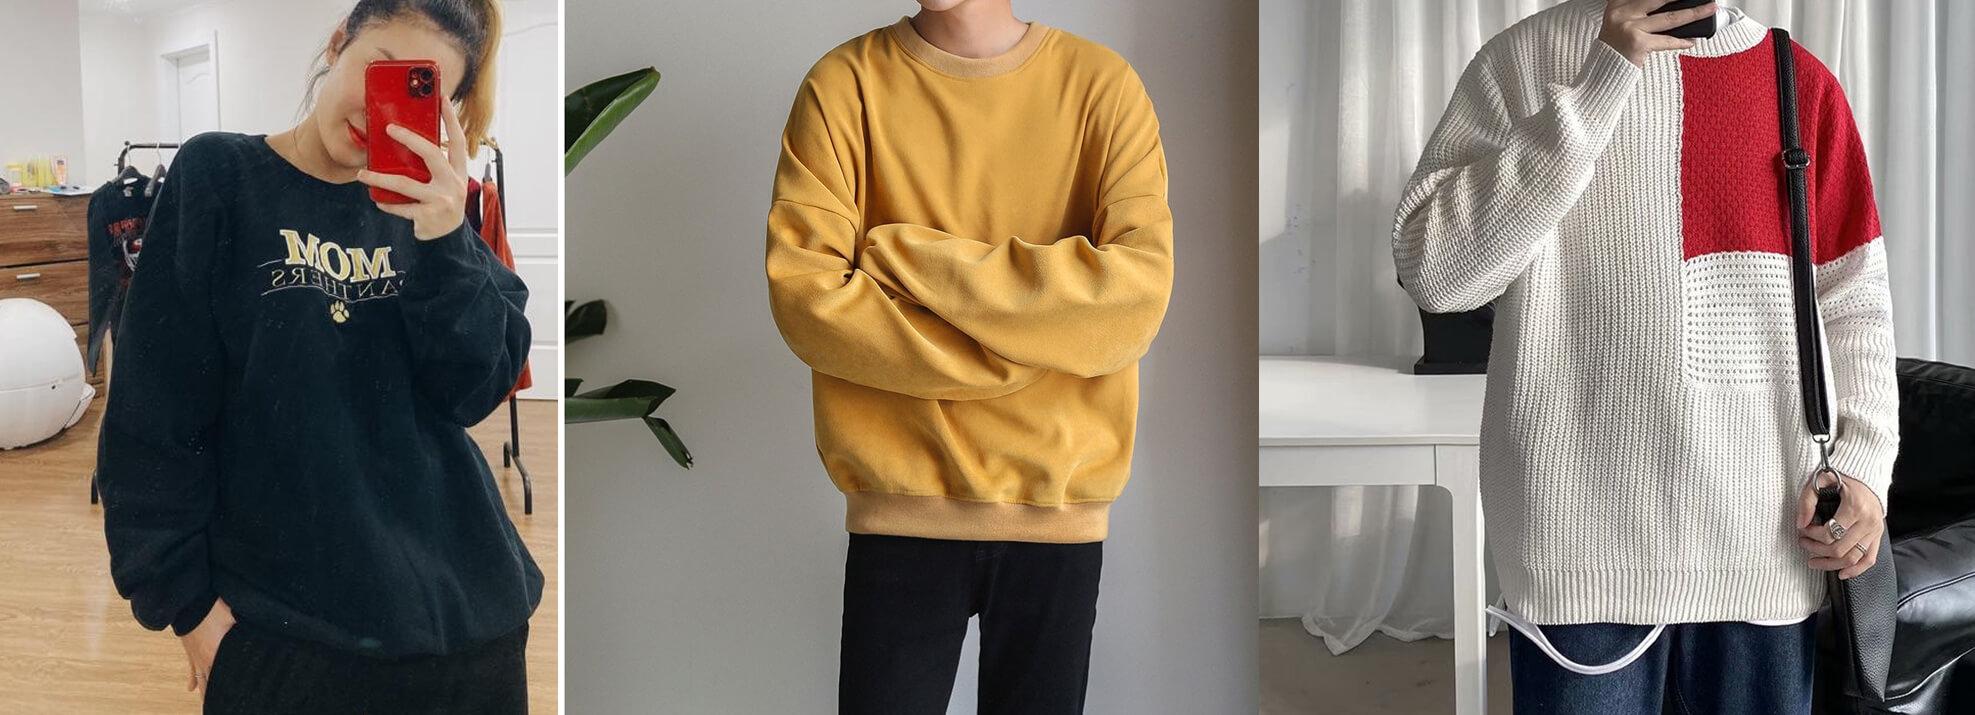 ao sweater la ao duoc lam bang vai ni vai len co tay bo nam nu deu mac duoc